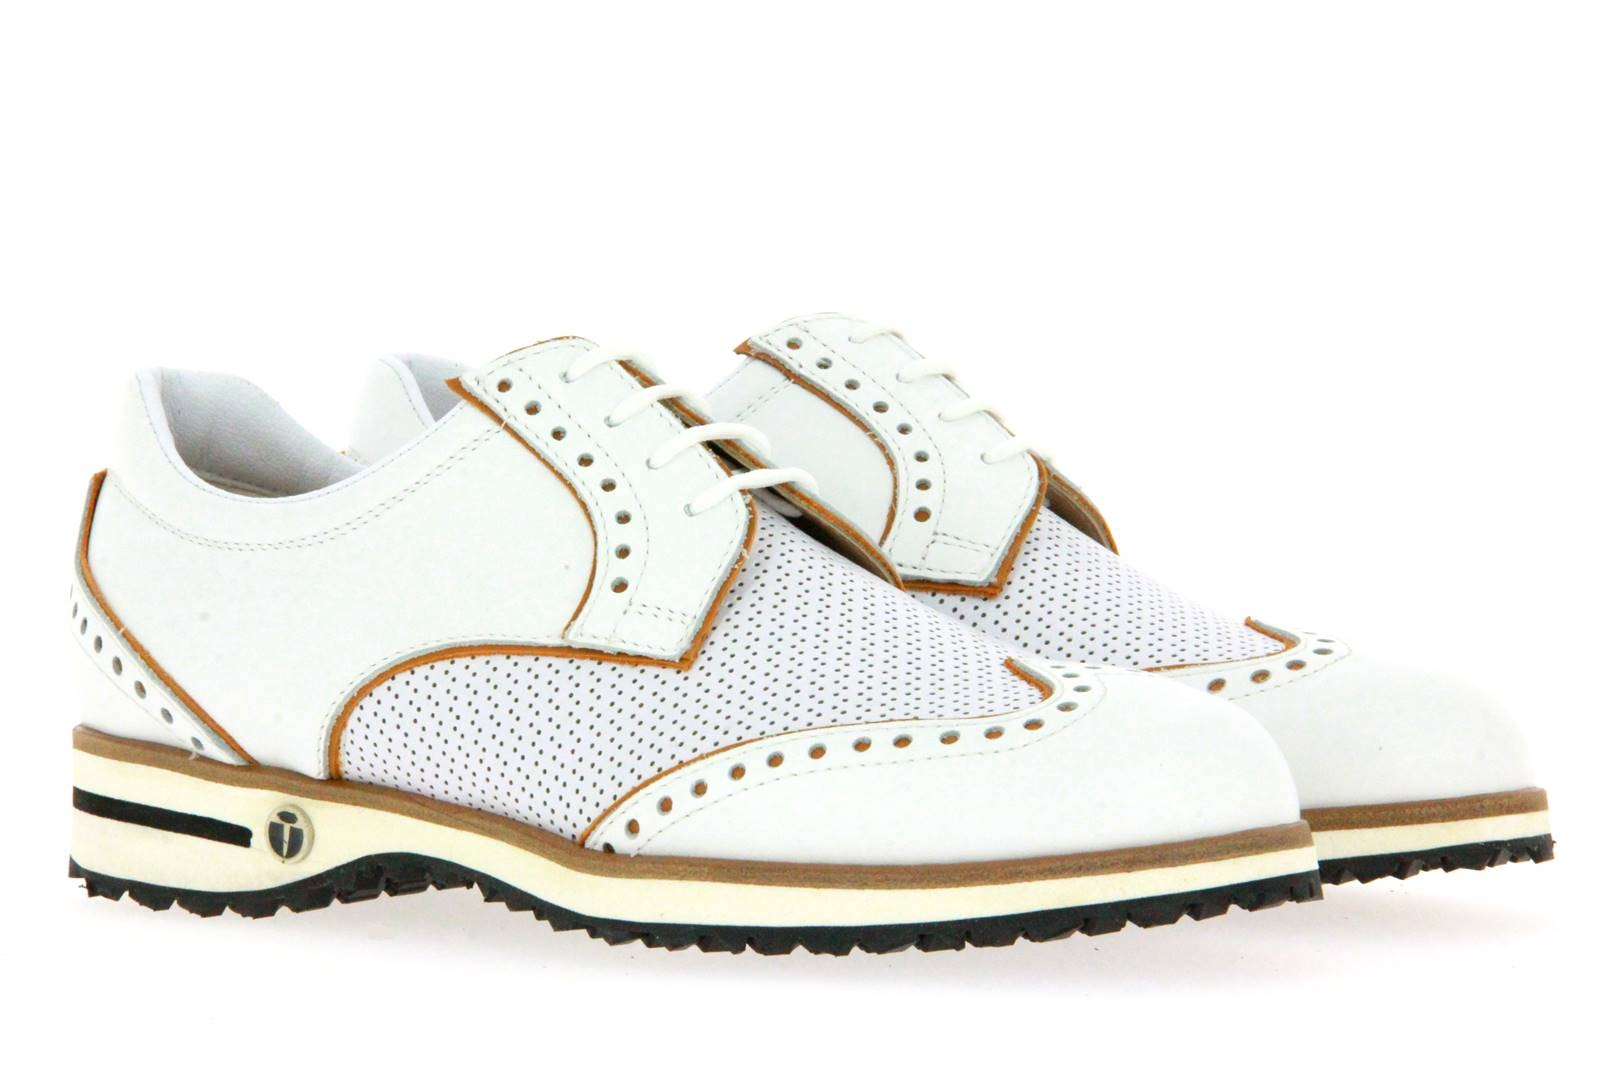 Tee Golf Shoes Damen- Golfschuh SALLY VITELLO GOLF BIANCO PAGLIA (40)